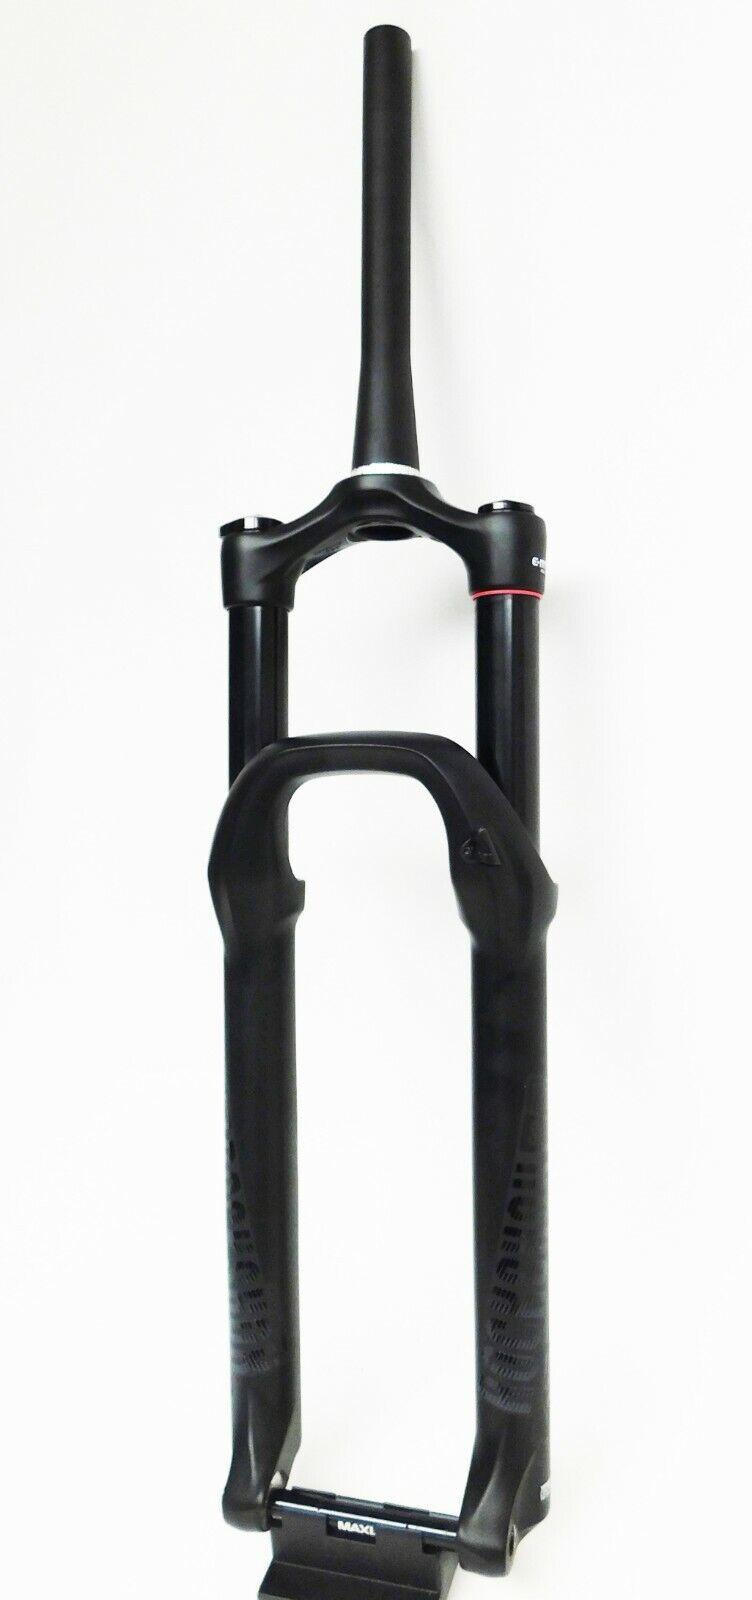 Rock Shox Recon 29er 15mm x 110mm TA MTB Bike Suspension Fork Tapered NEW